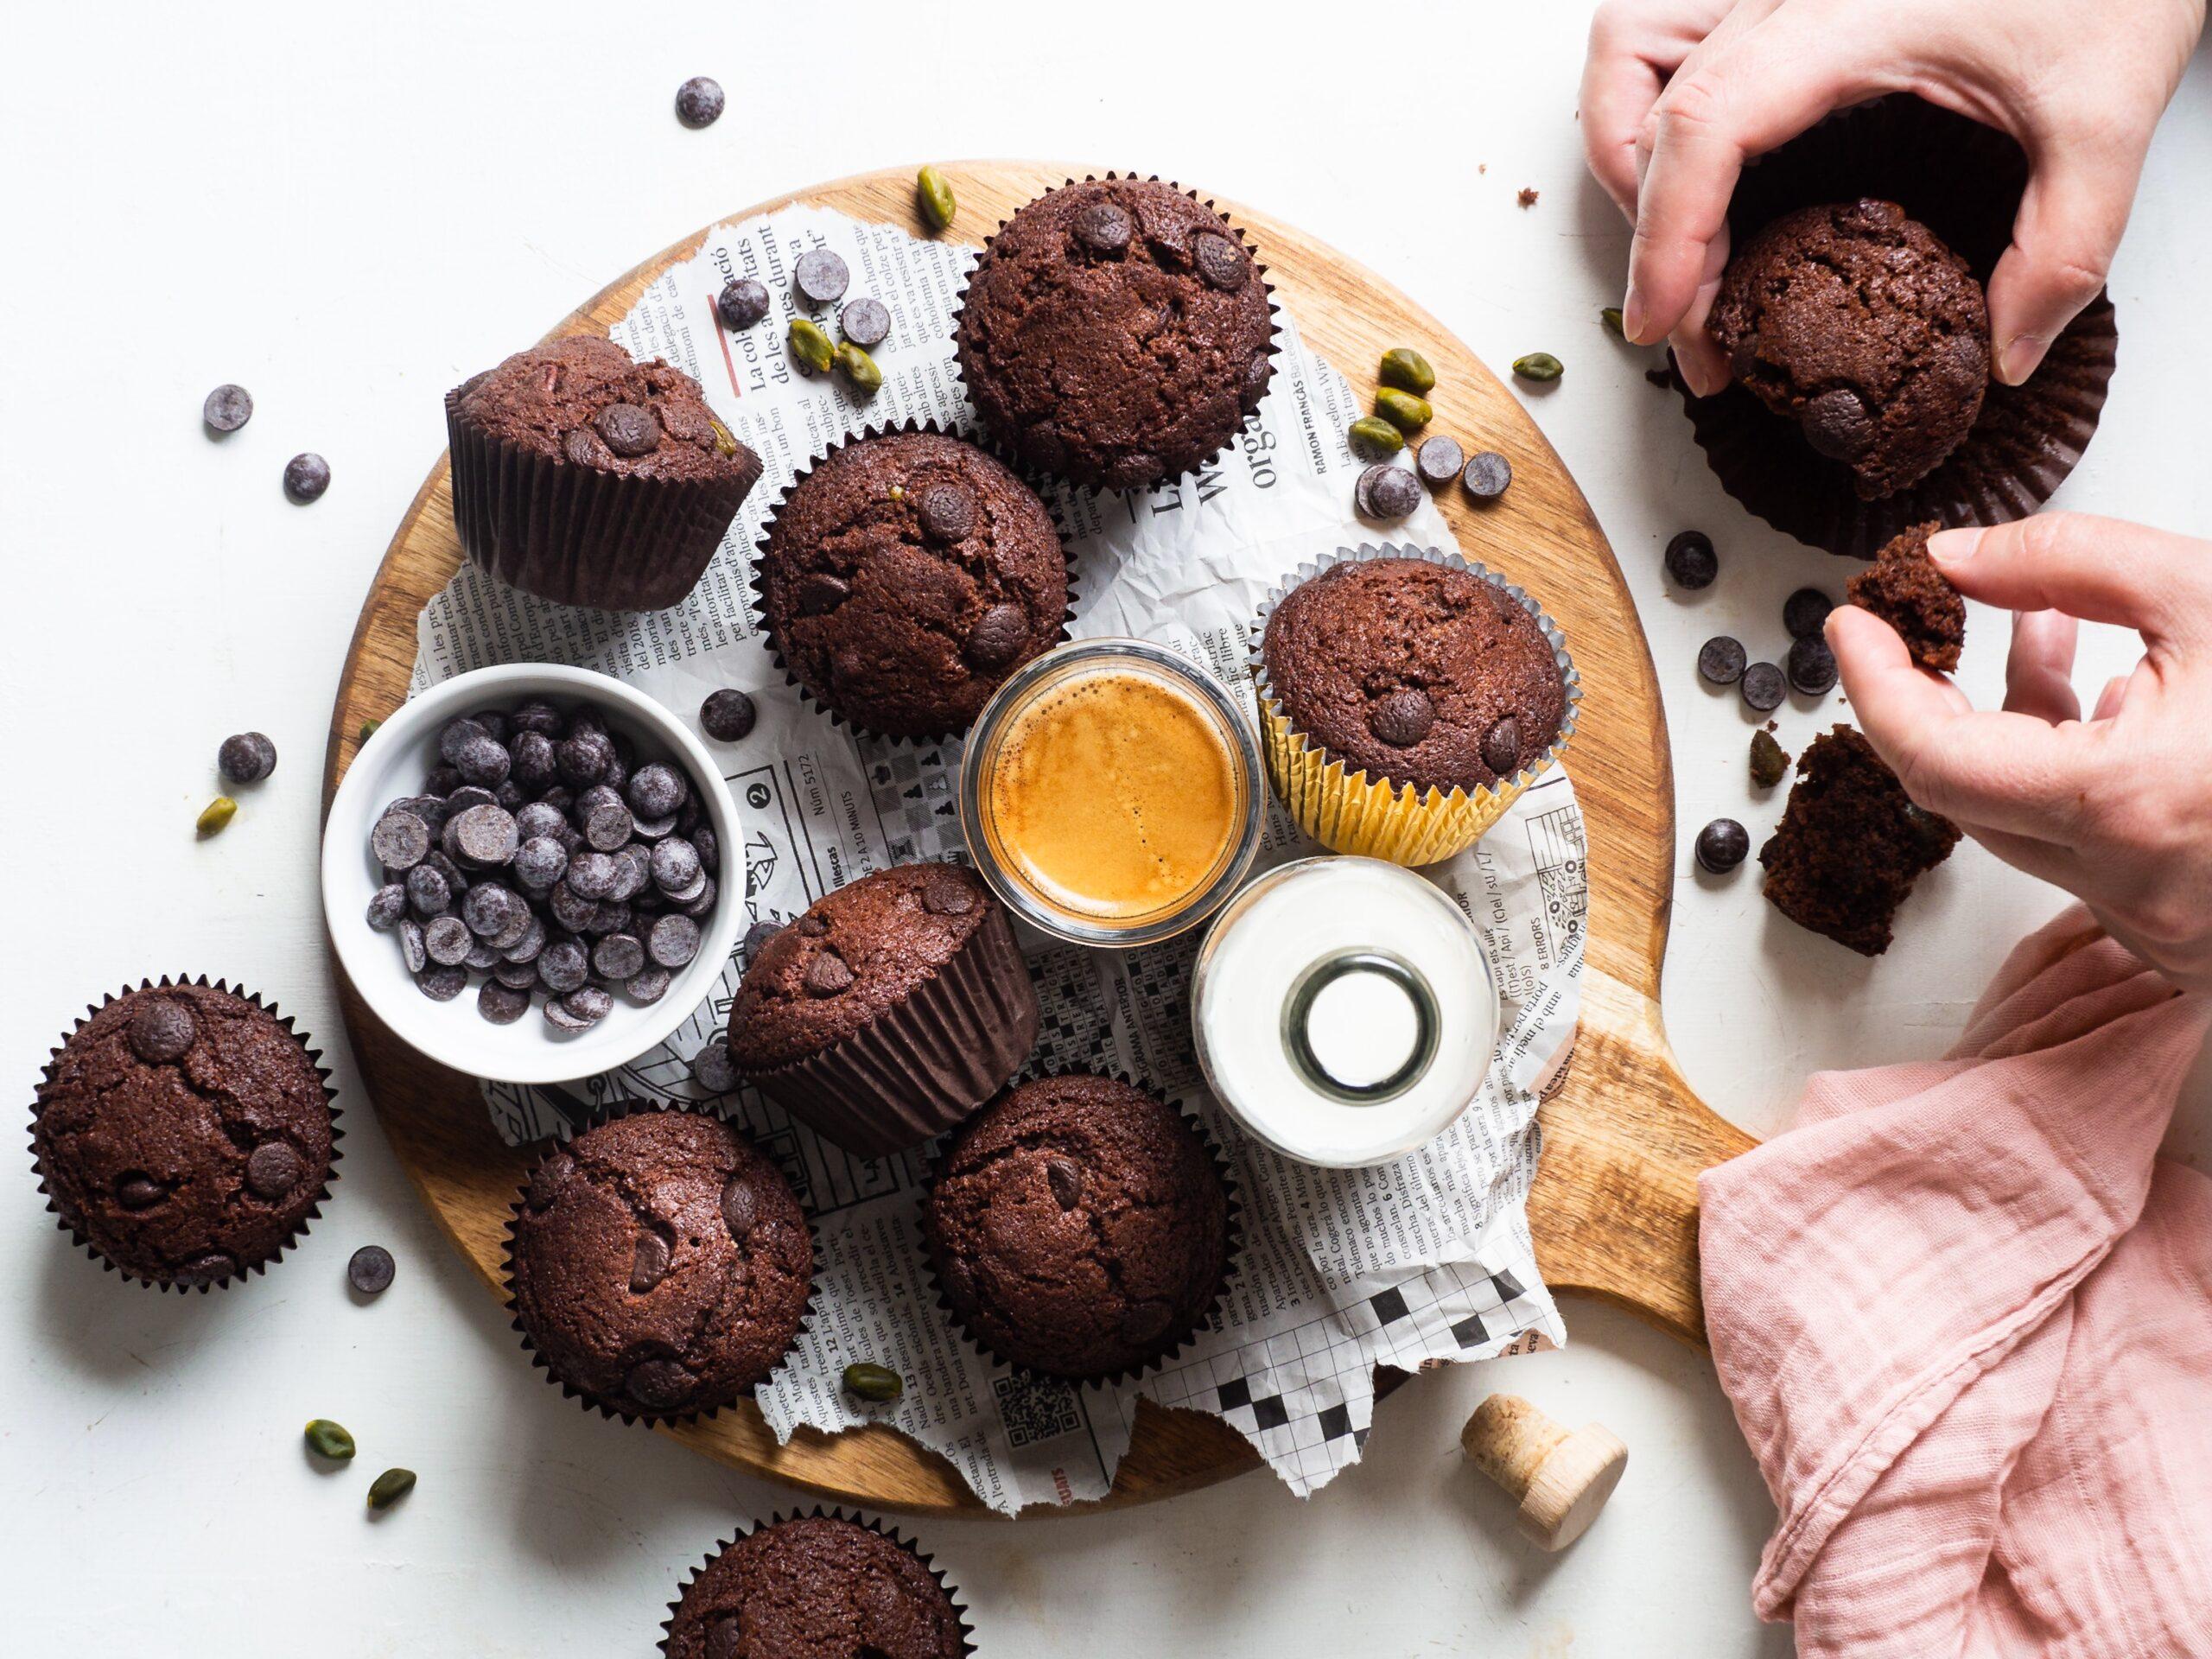 eating snacks cupcakes